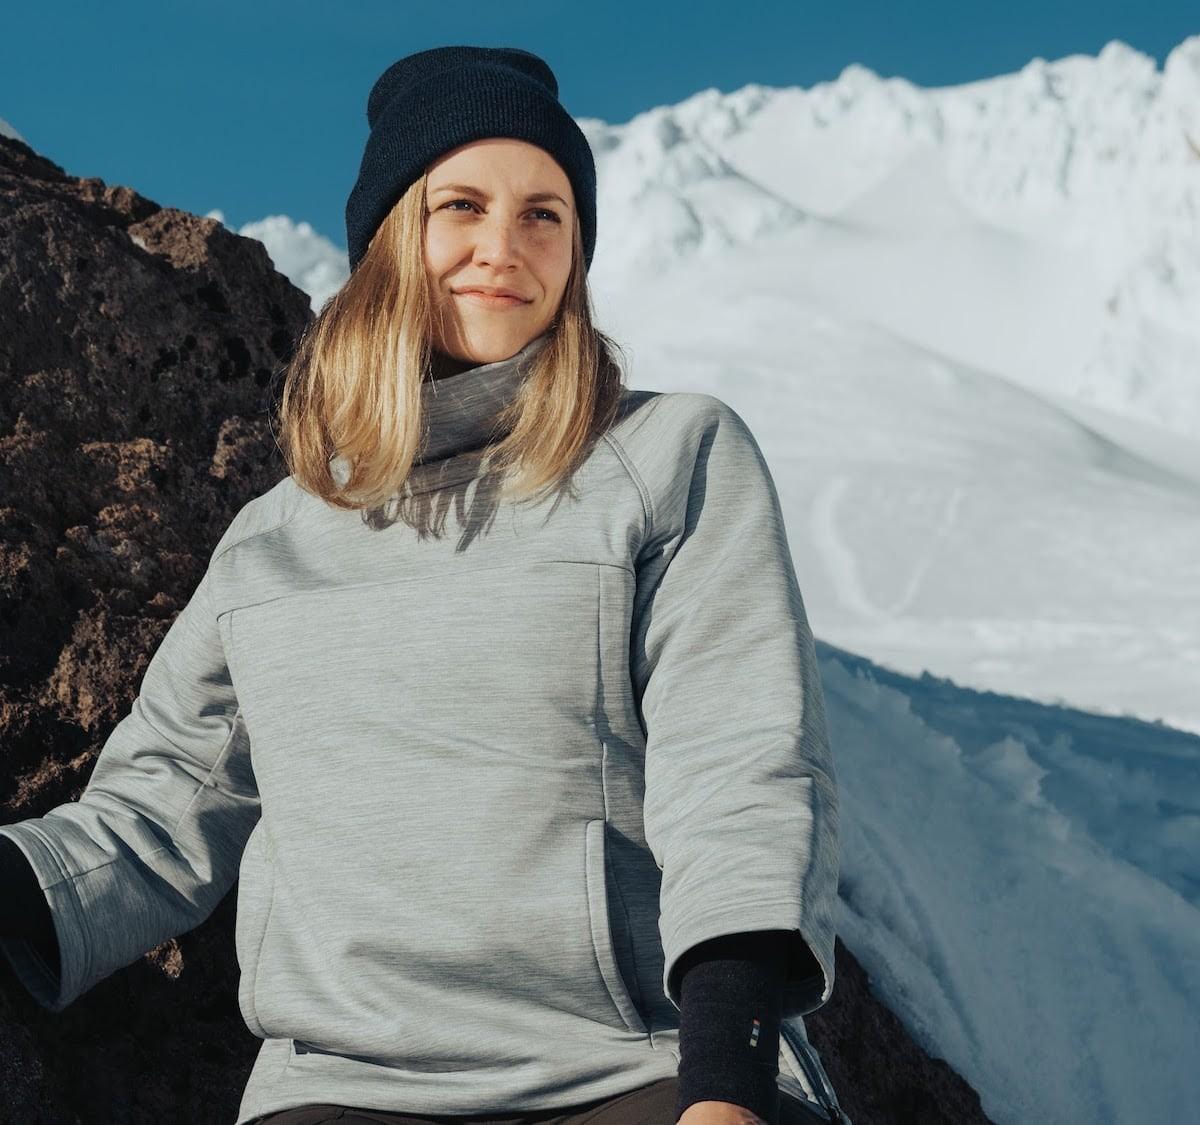 OROS Warm Outerwear uses the same insulation as NASA